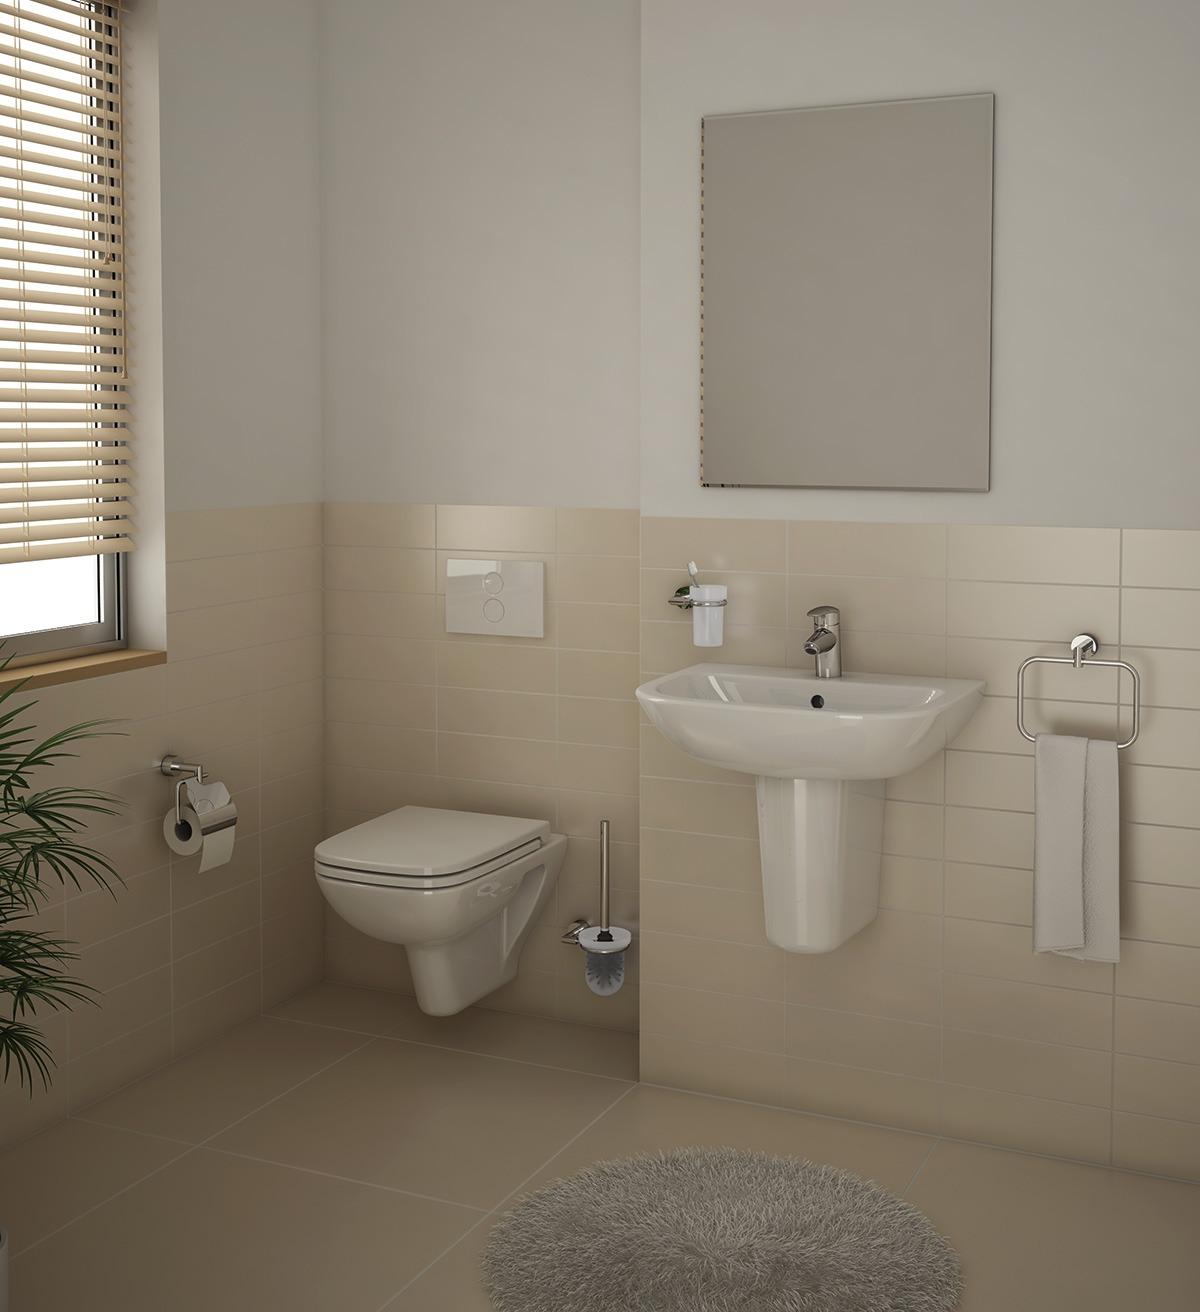 Bathroom Sinks Northern Ireland vitra uk s20 wall-hung toilet. northern ireland.